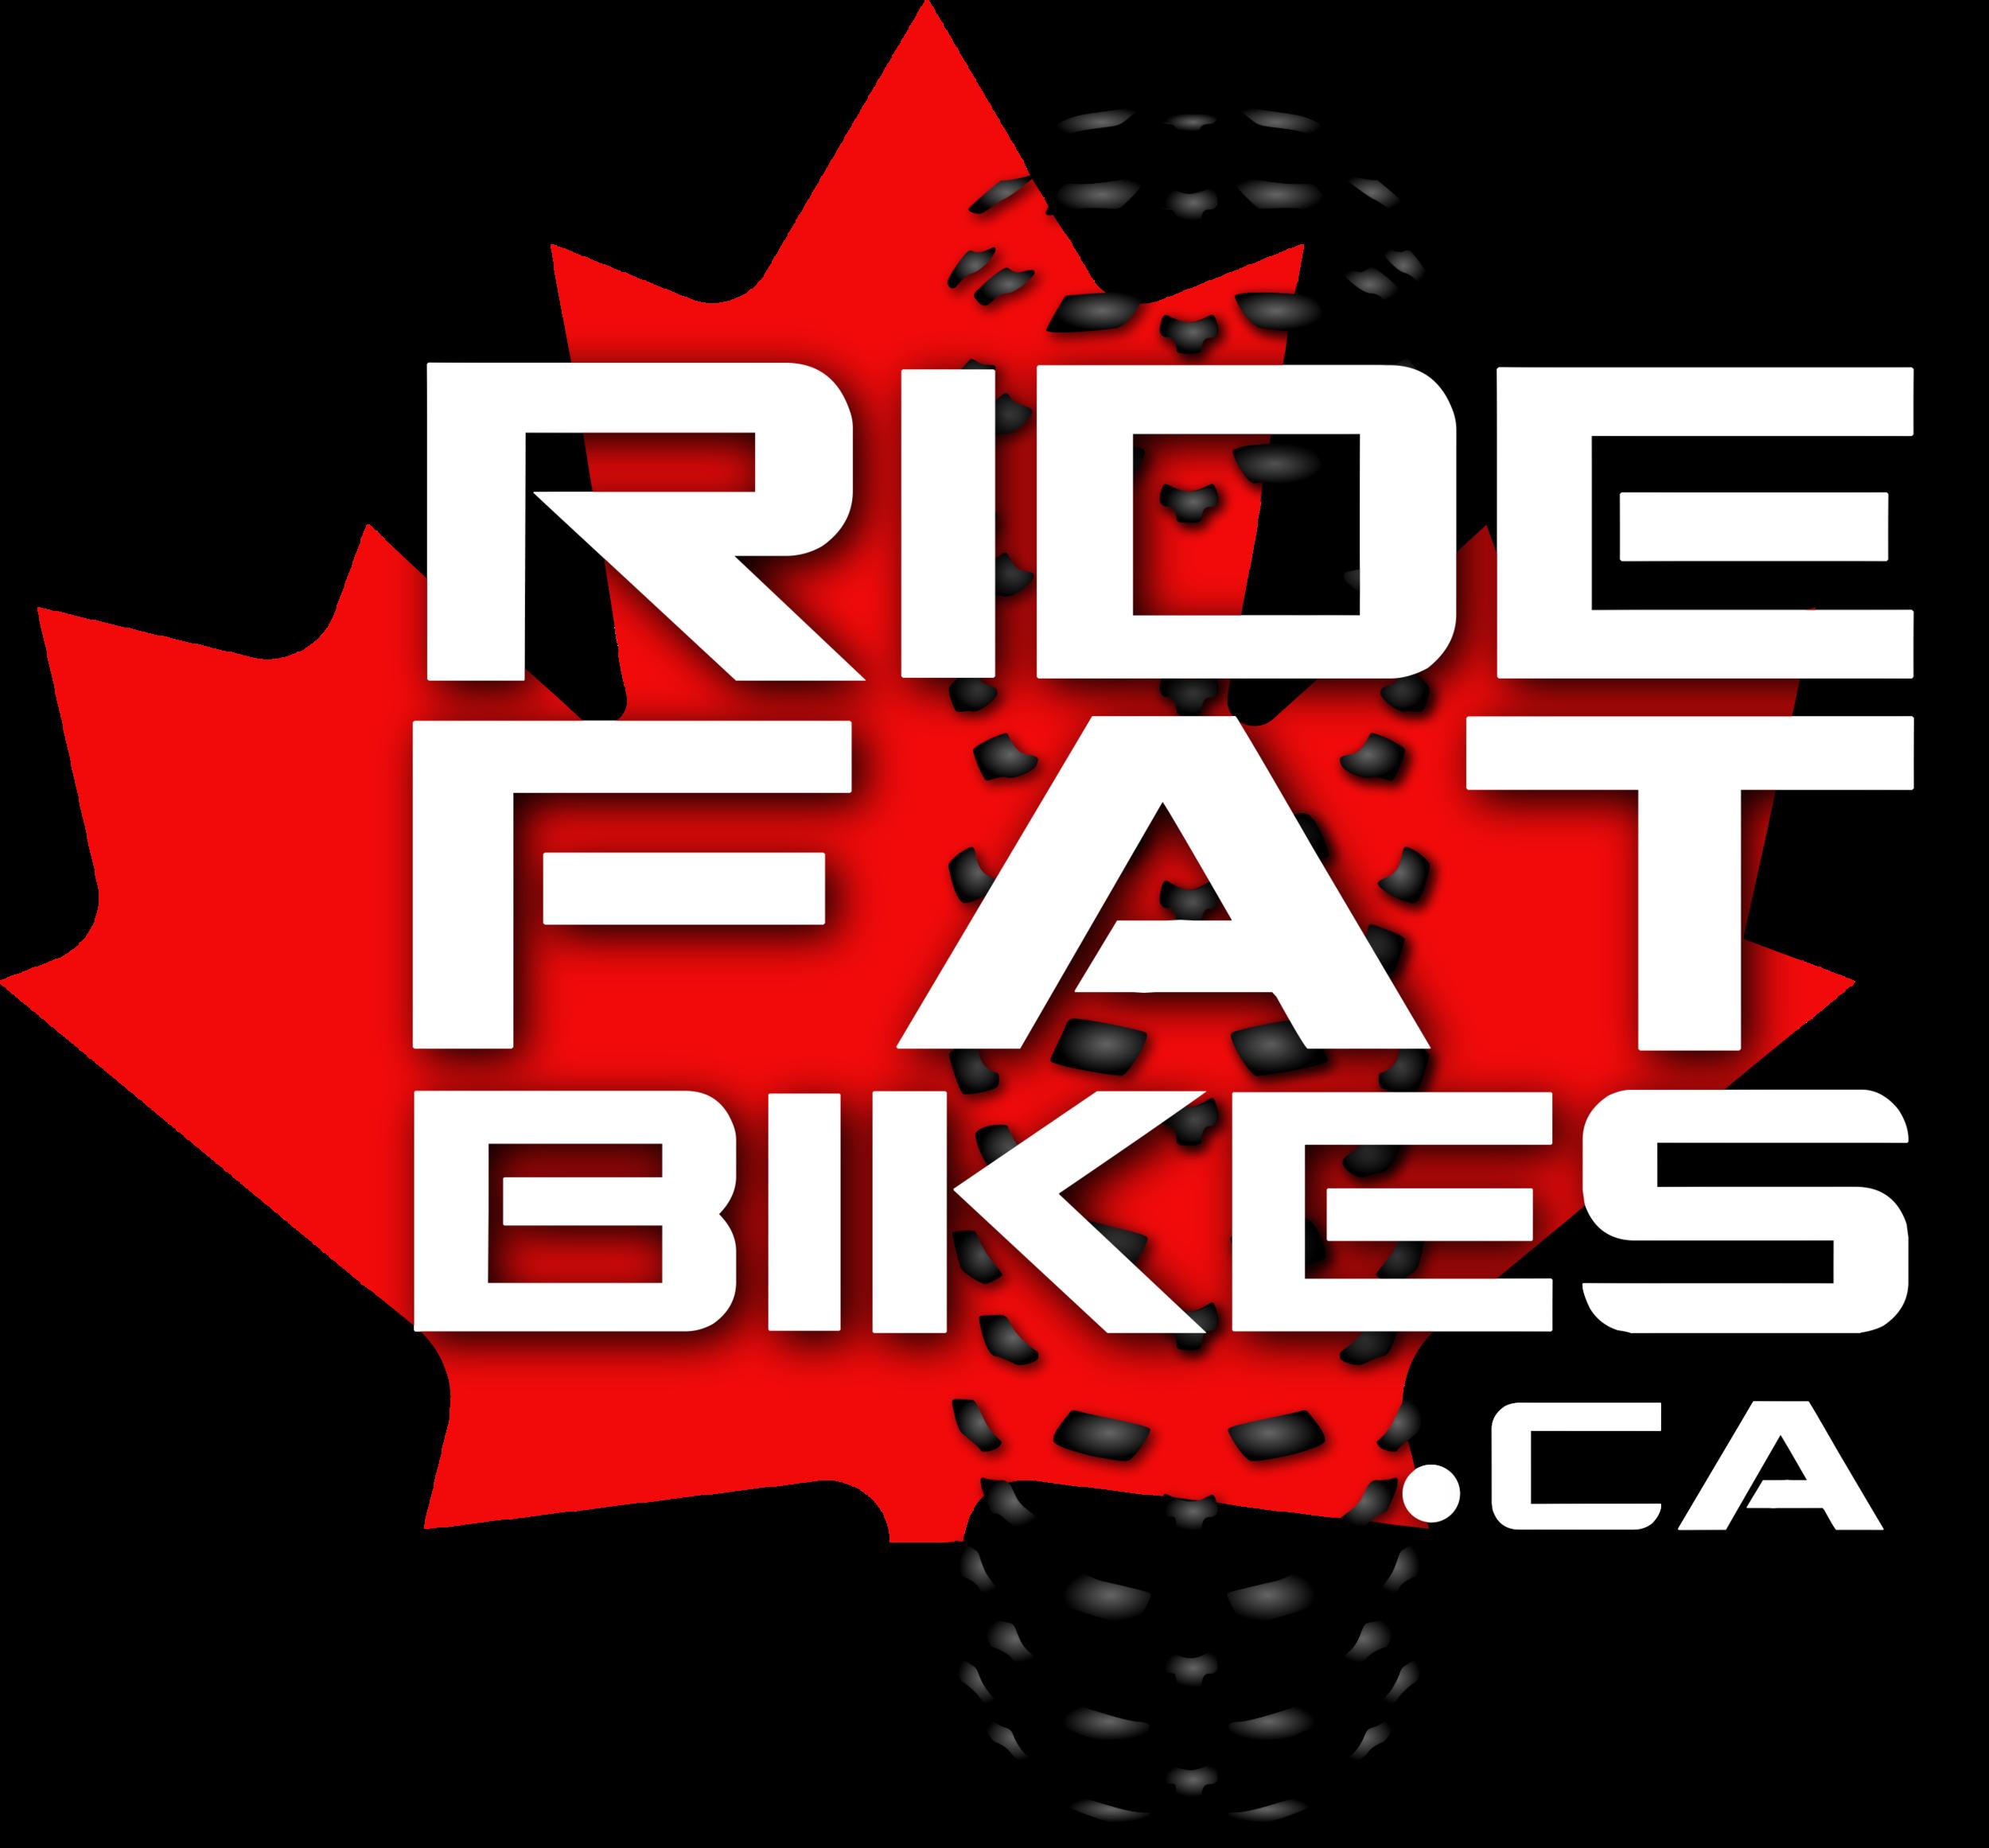 RIDEFATBIKES.ca LOGO - Custom Built Fat bikes in Canada